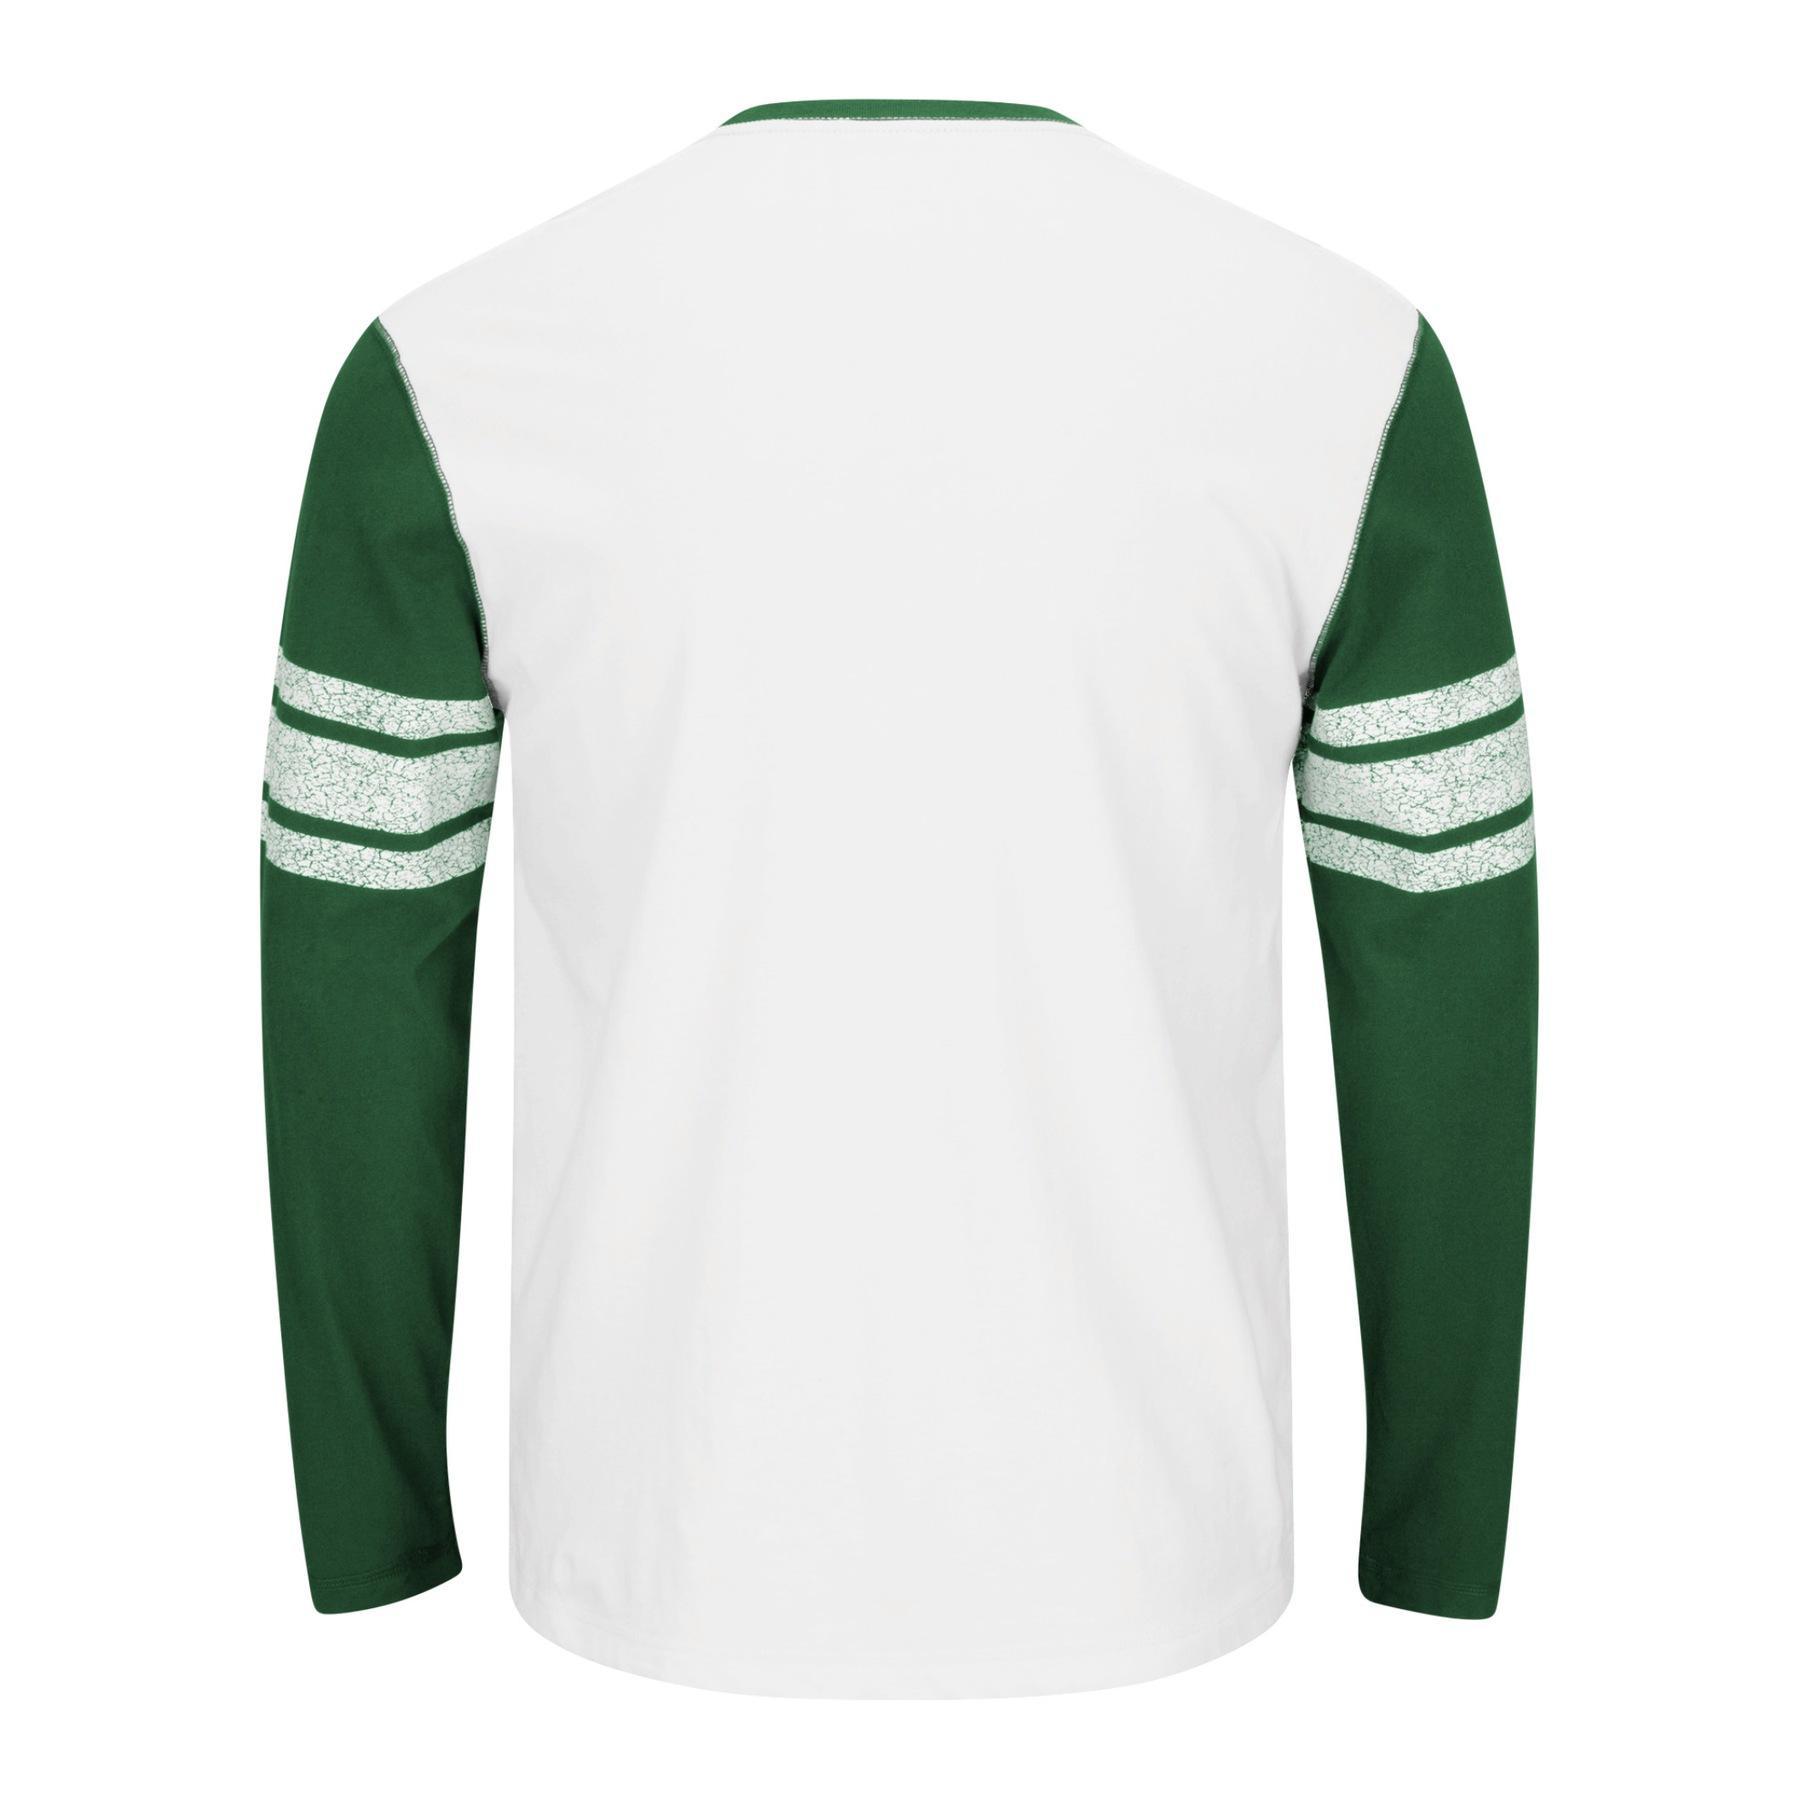 NFL Men's Raglan Shirt - New York Jets